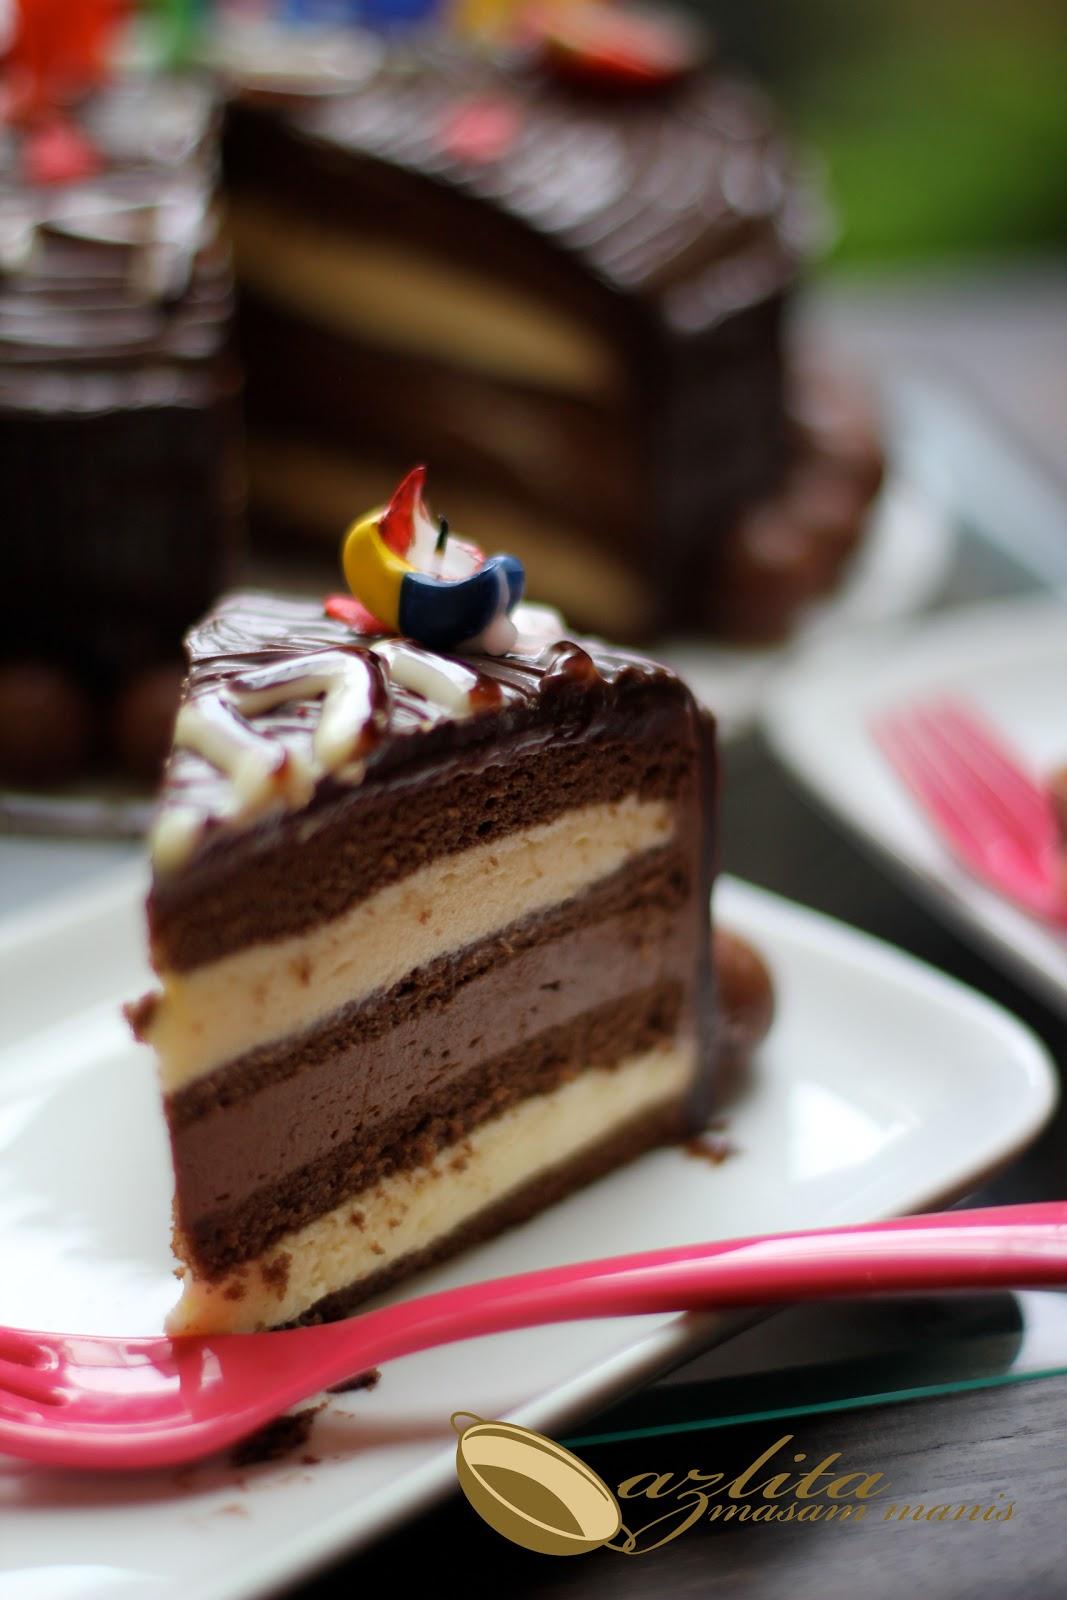 Chocolate Indulgence Masam Manis